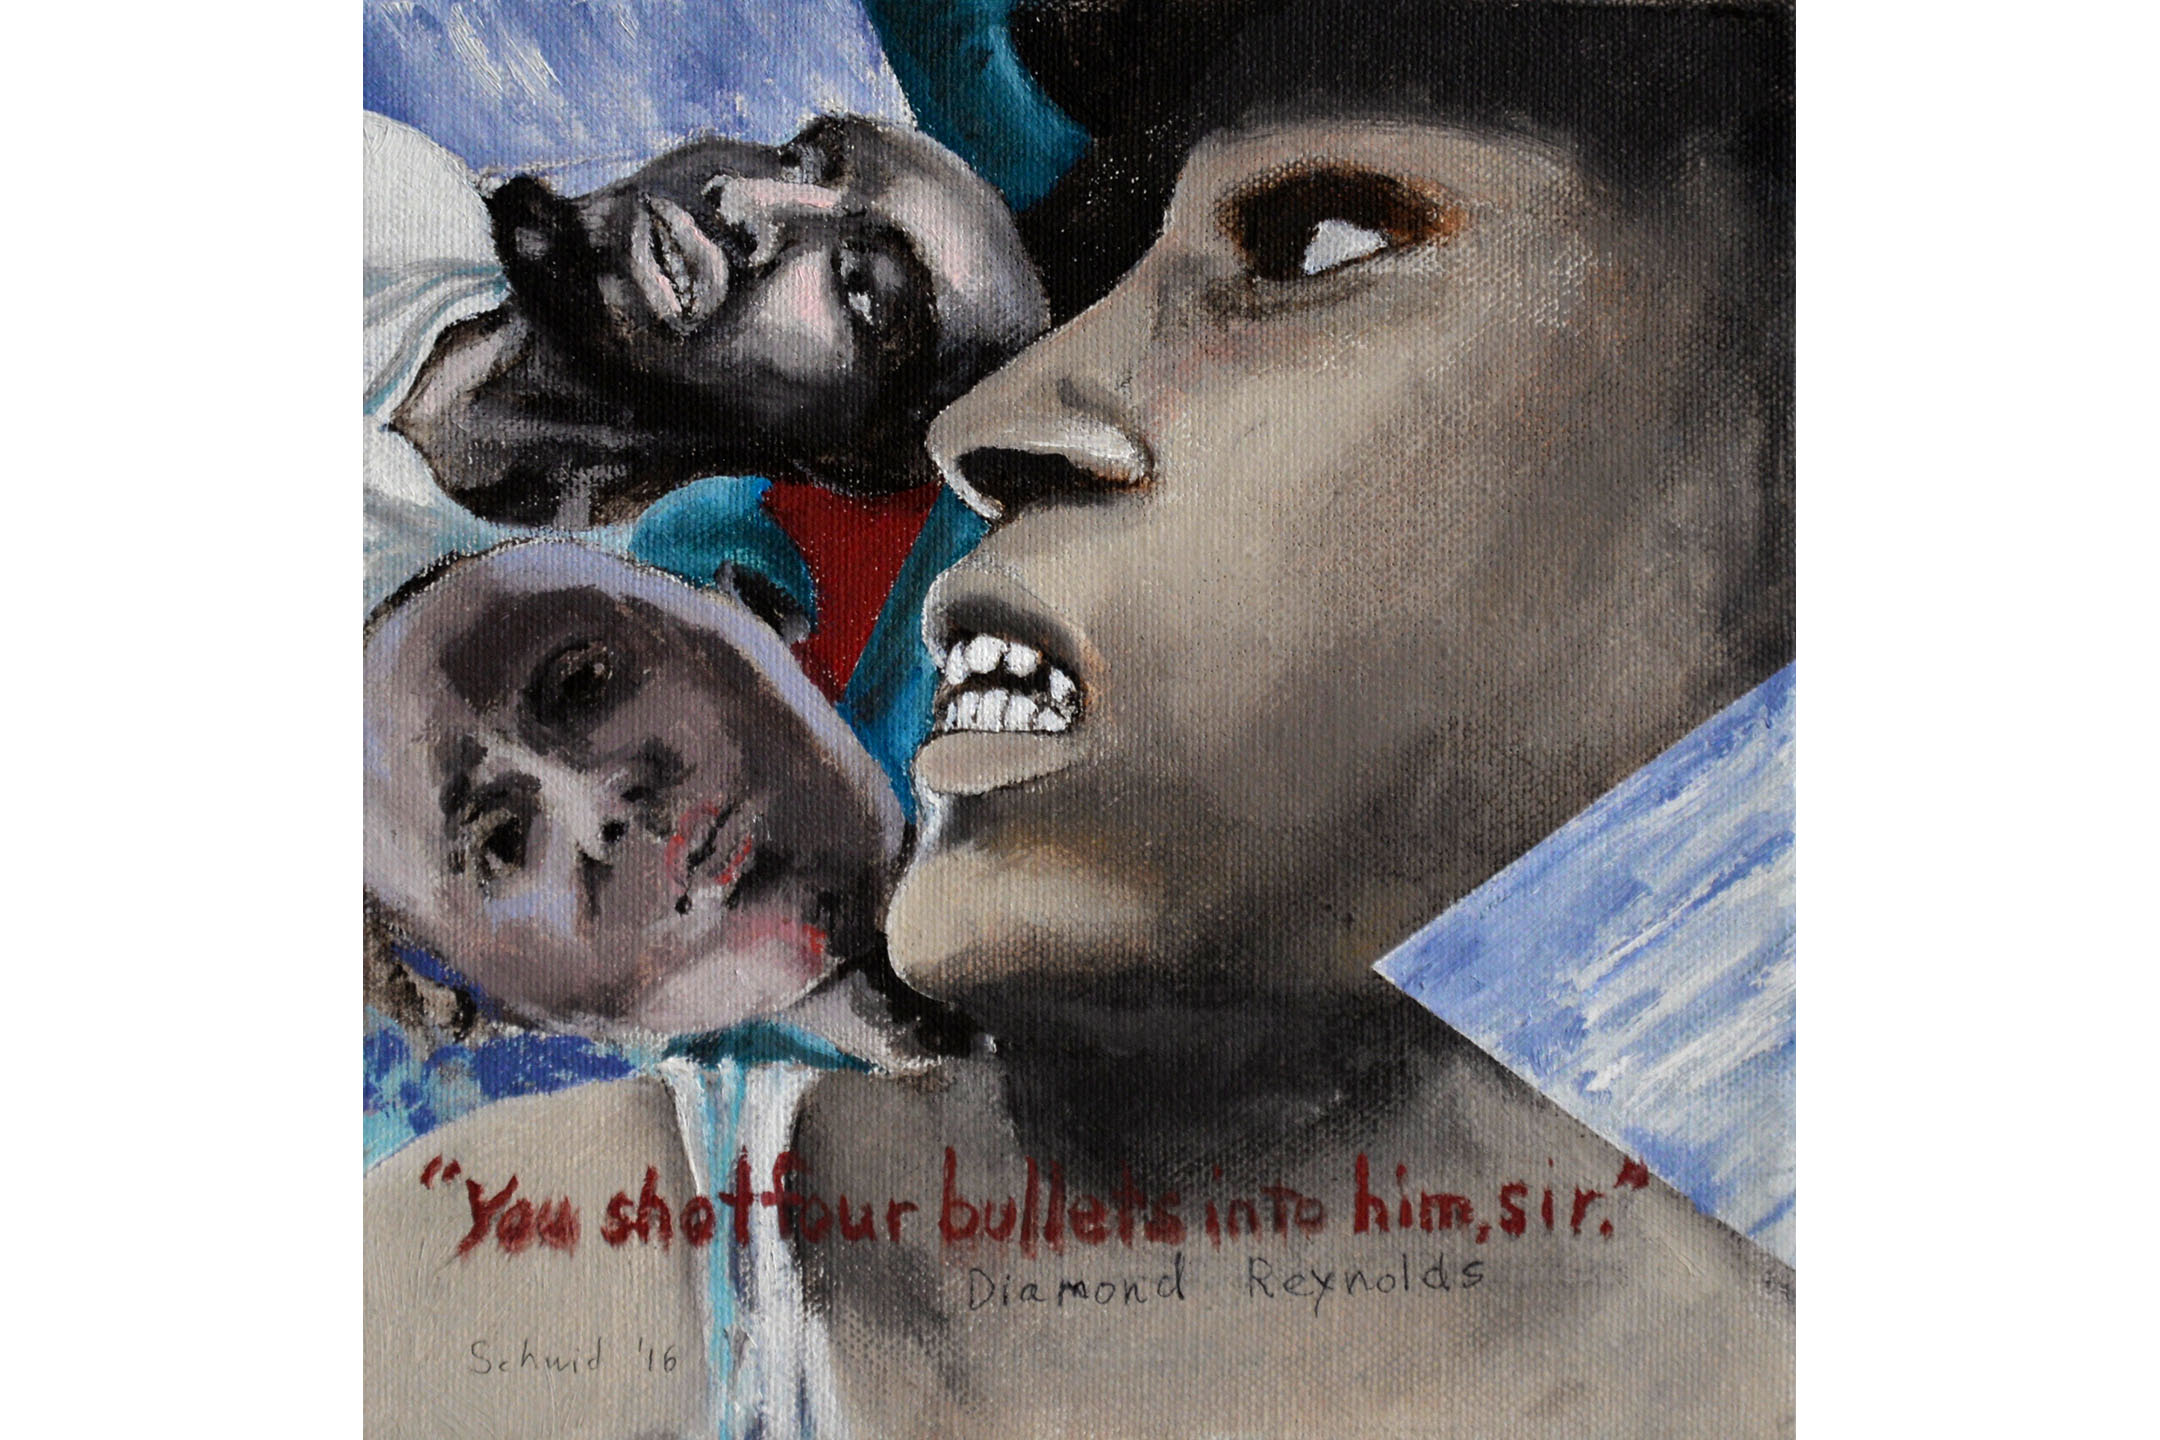 "Sheila Schwid, ""You shot four bullets into him, sir."", Oil on canvas, 8"" x 8"", 2016"